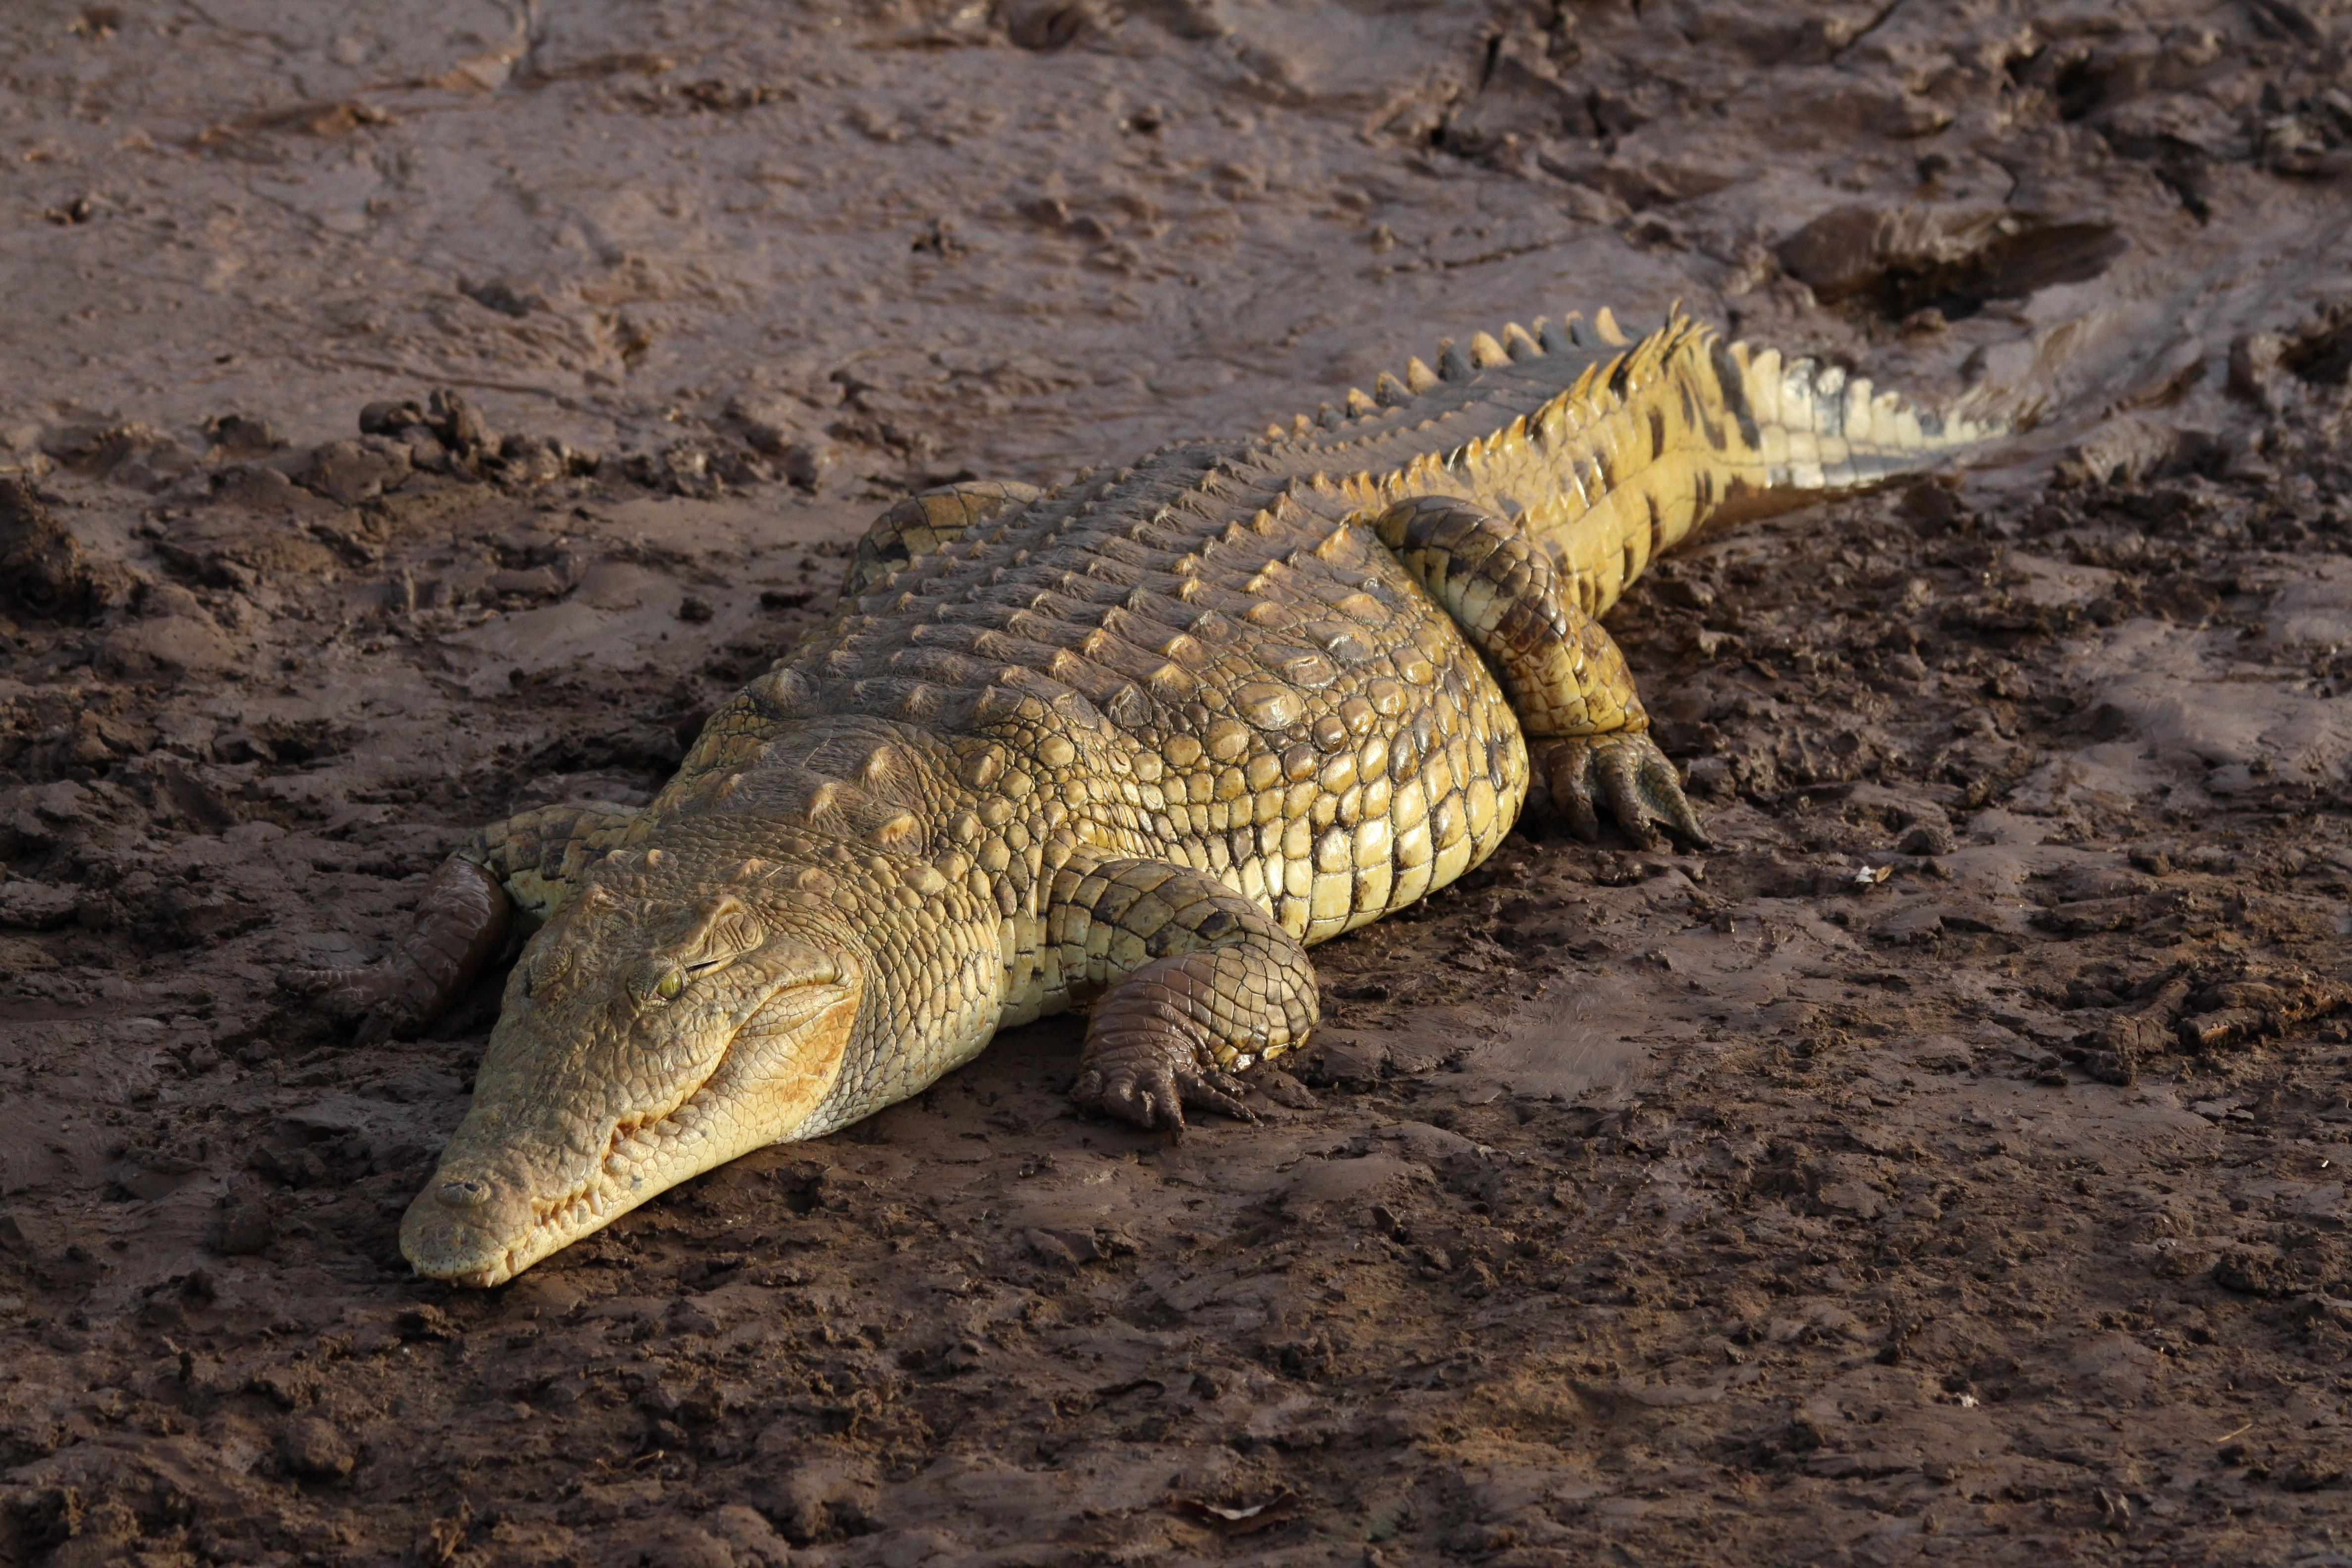 Krokodili Flickr_-_don_macauley_-_A_fat_crocodile_2